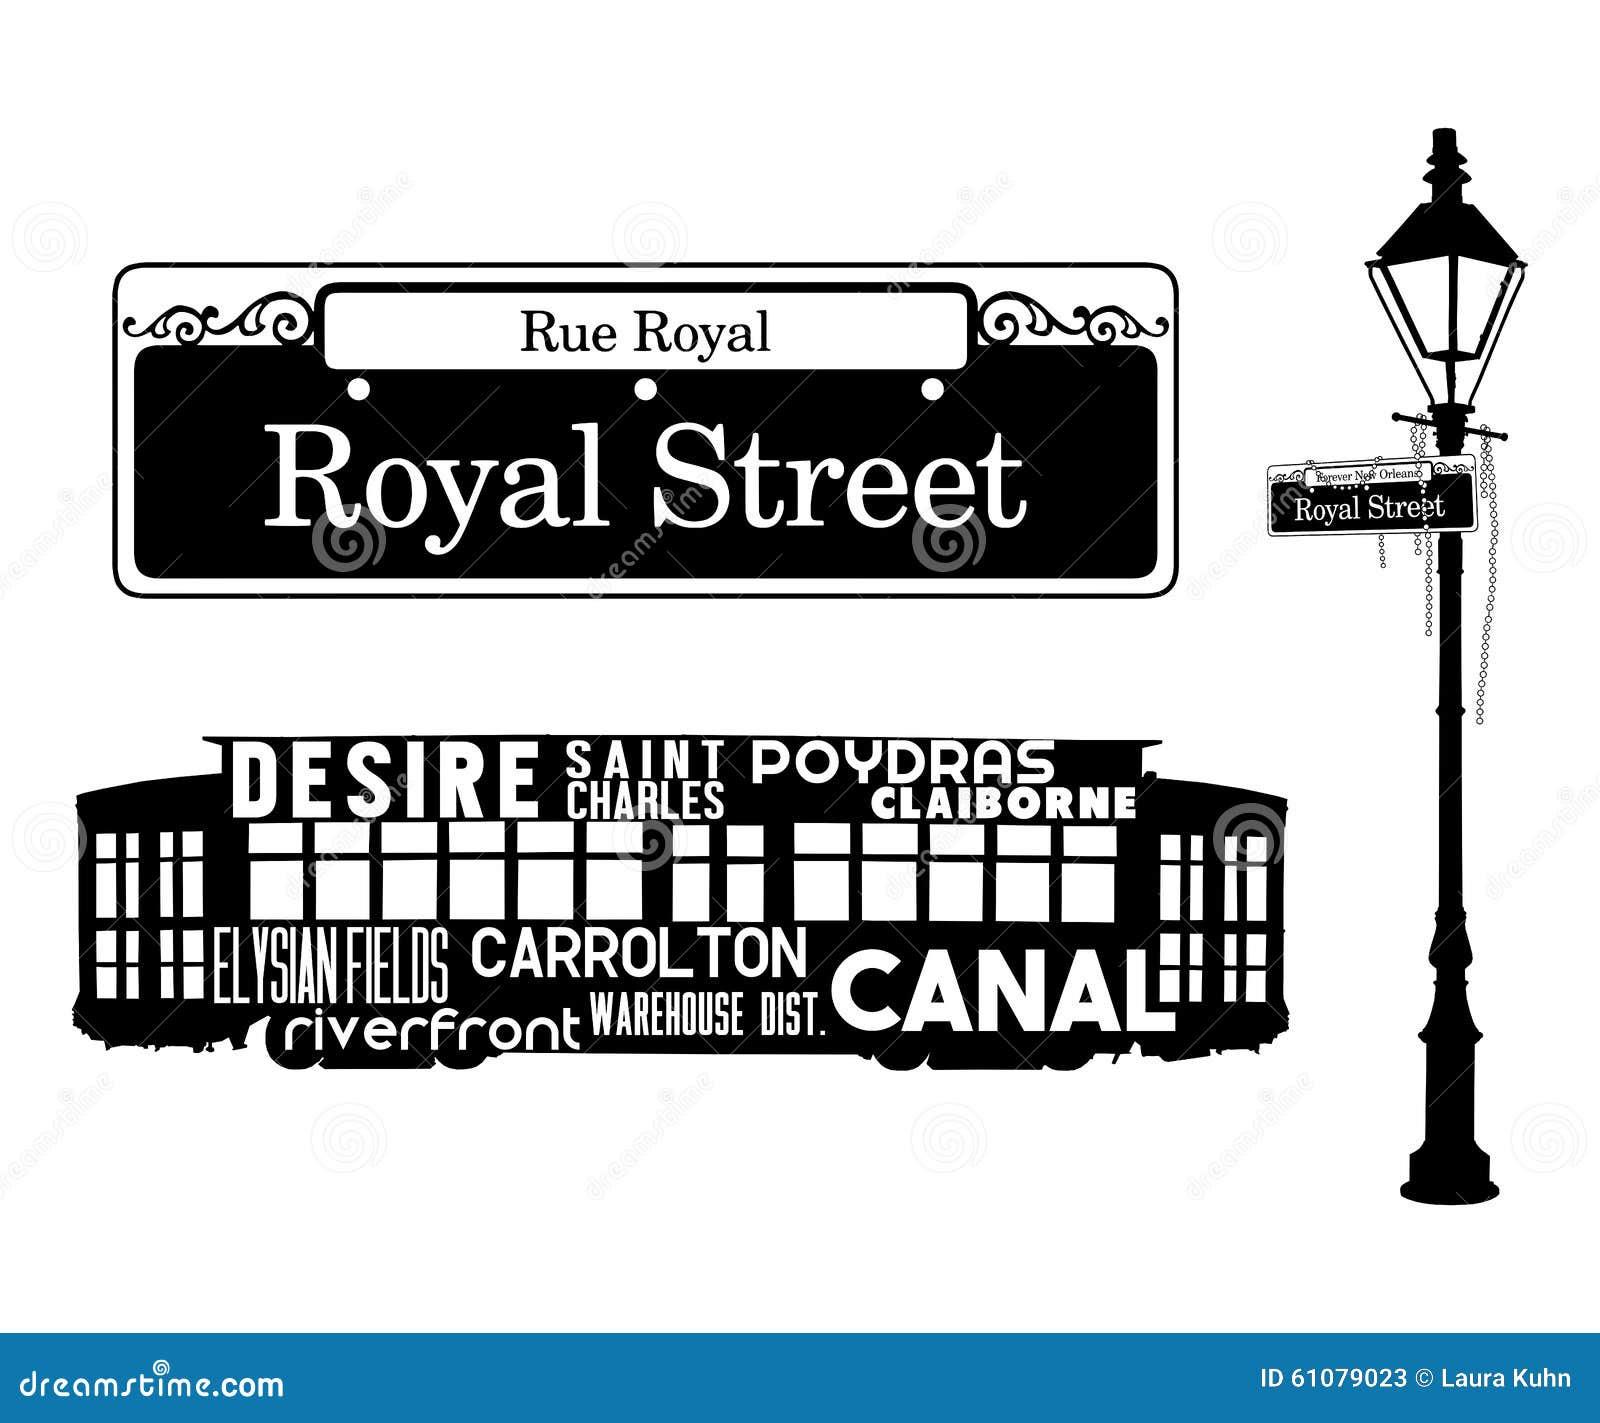 french quarter new orleans icons louisiana royal street st charles streetcar streetlight lamp mardi gras beads 61079023